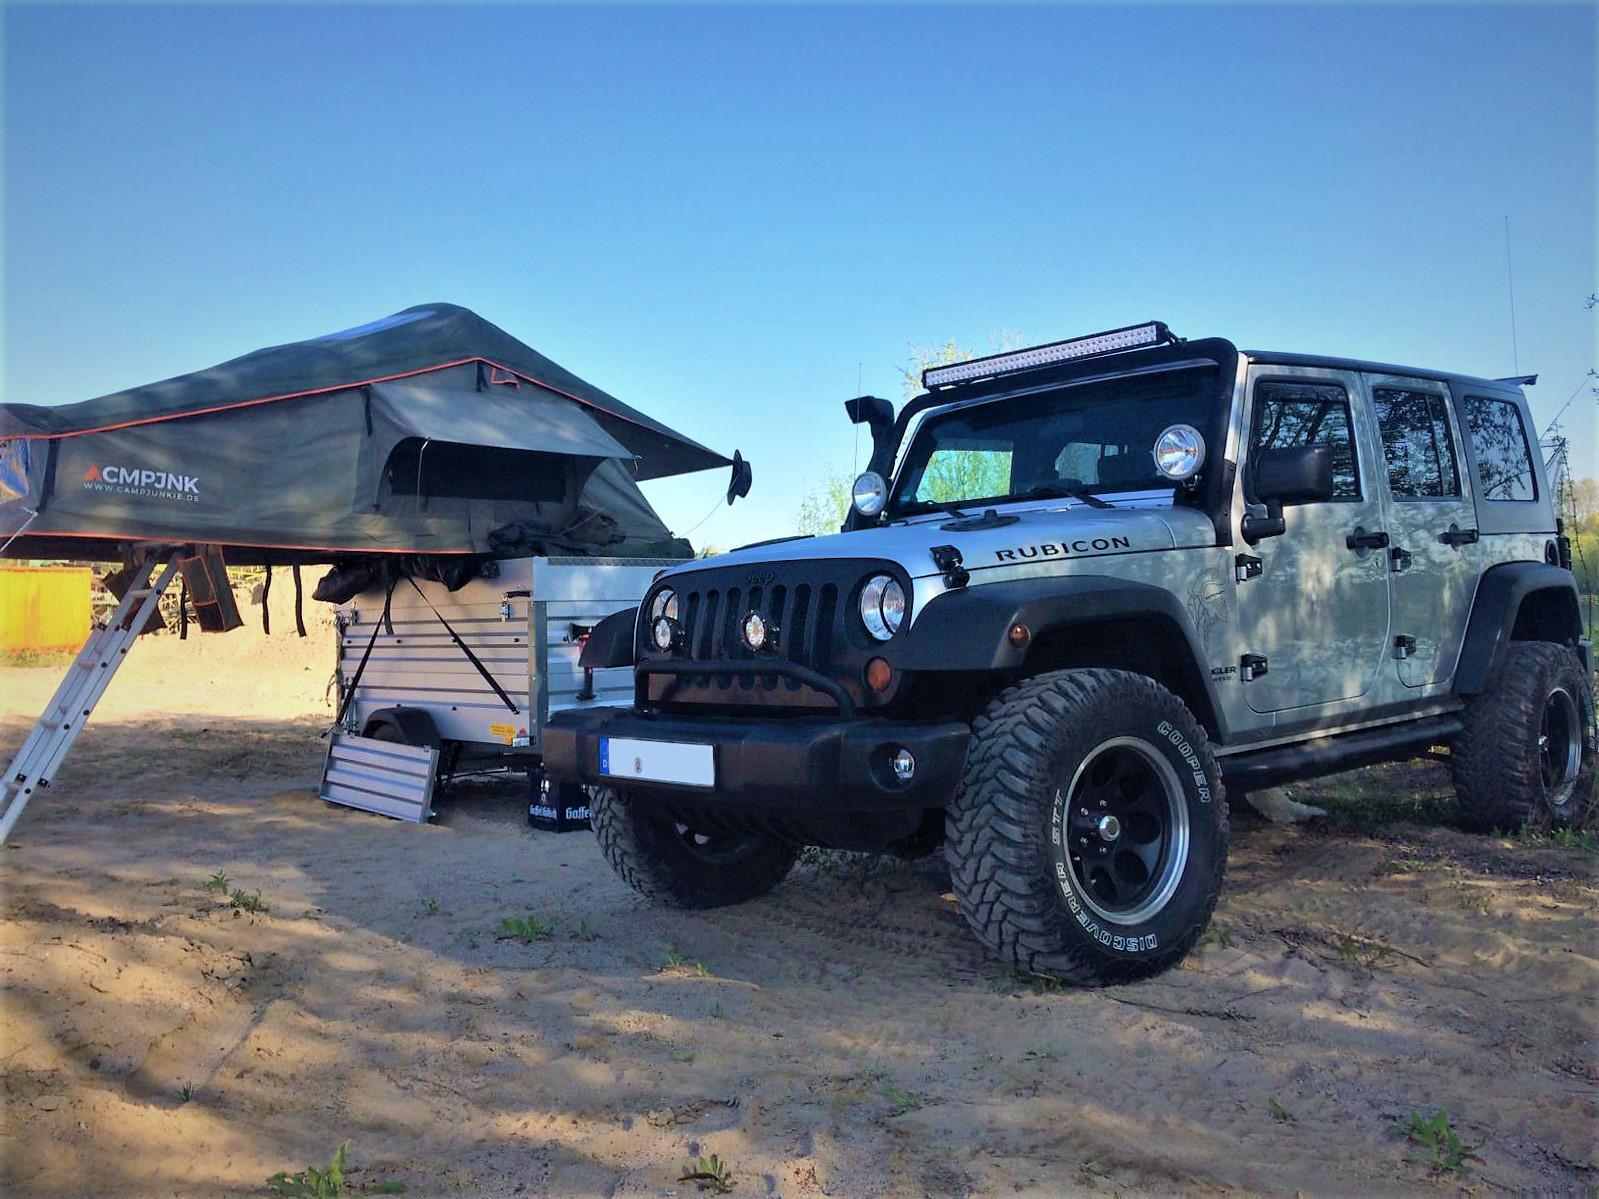 CMPJNK Jeep